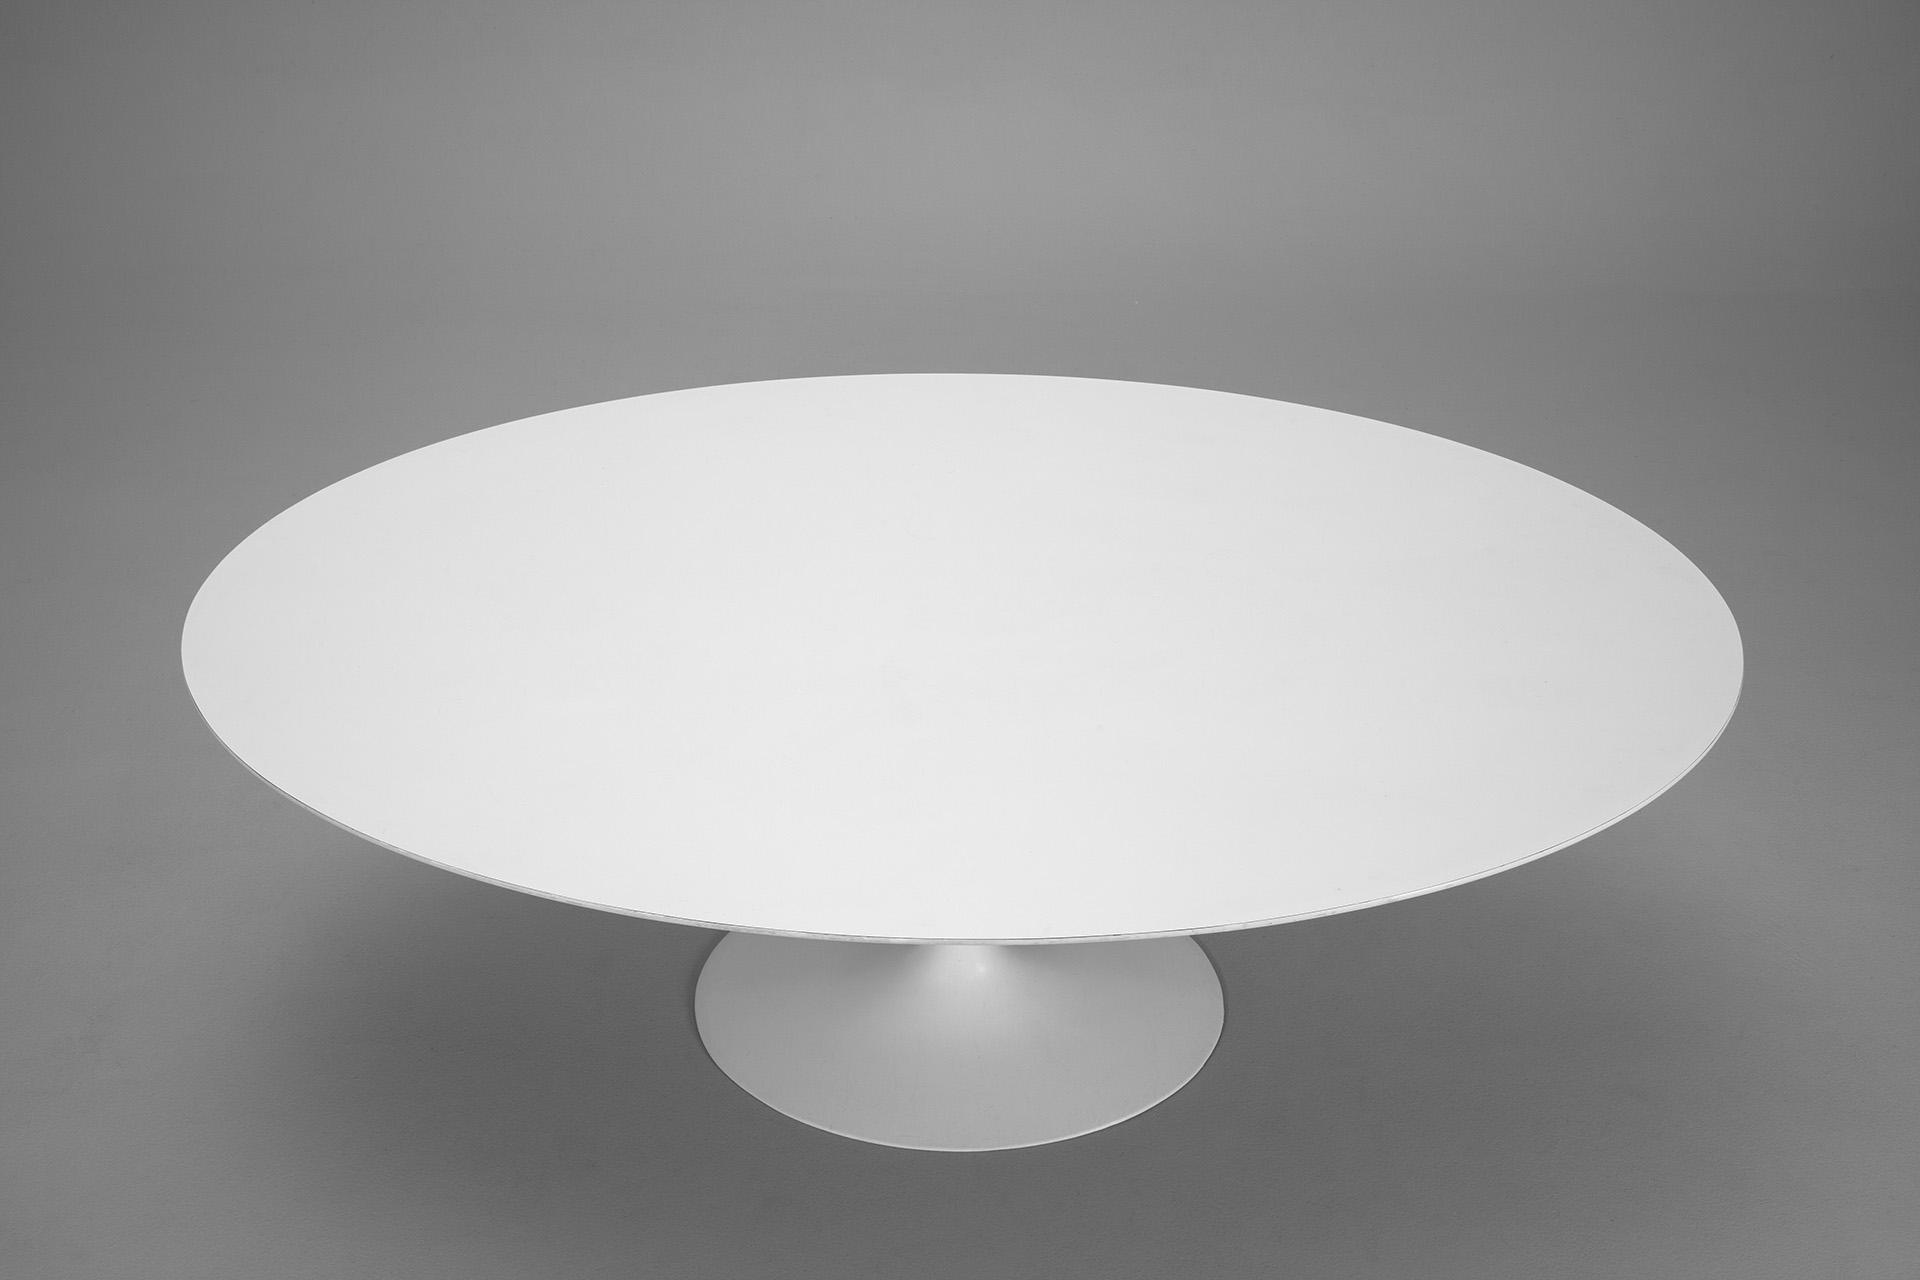 Jacksons Oval Tulip Table Eero Saarinen